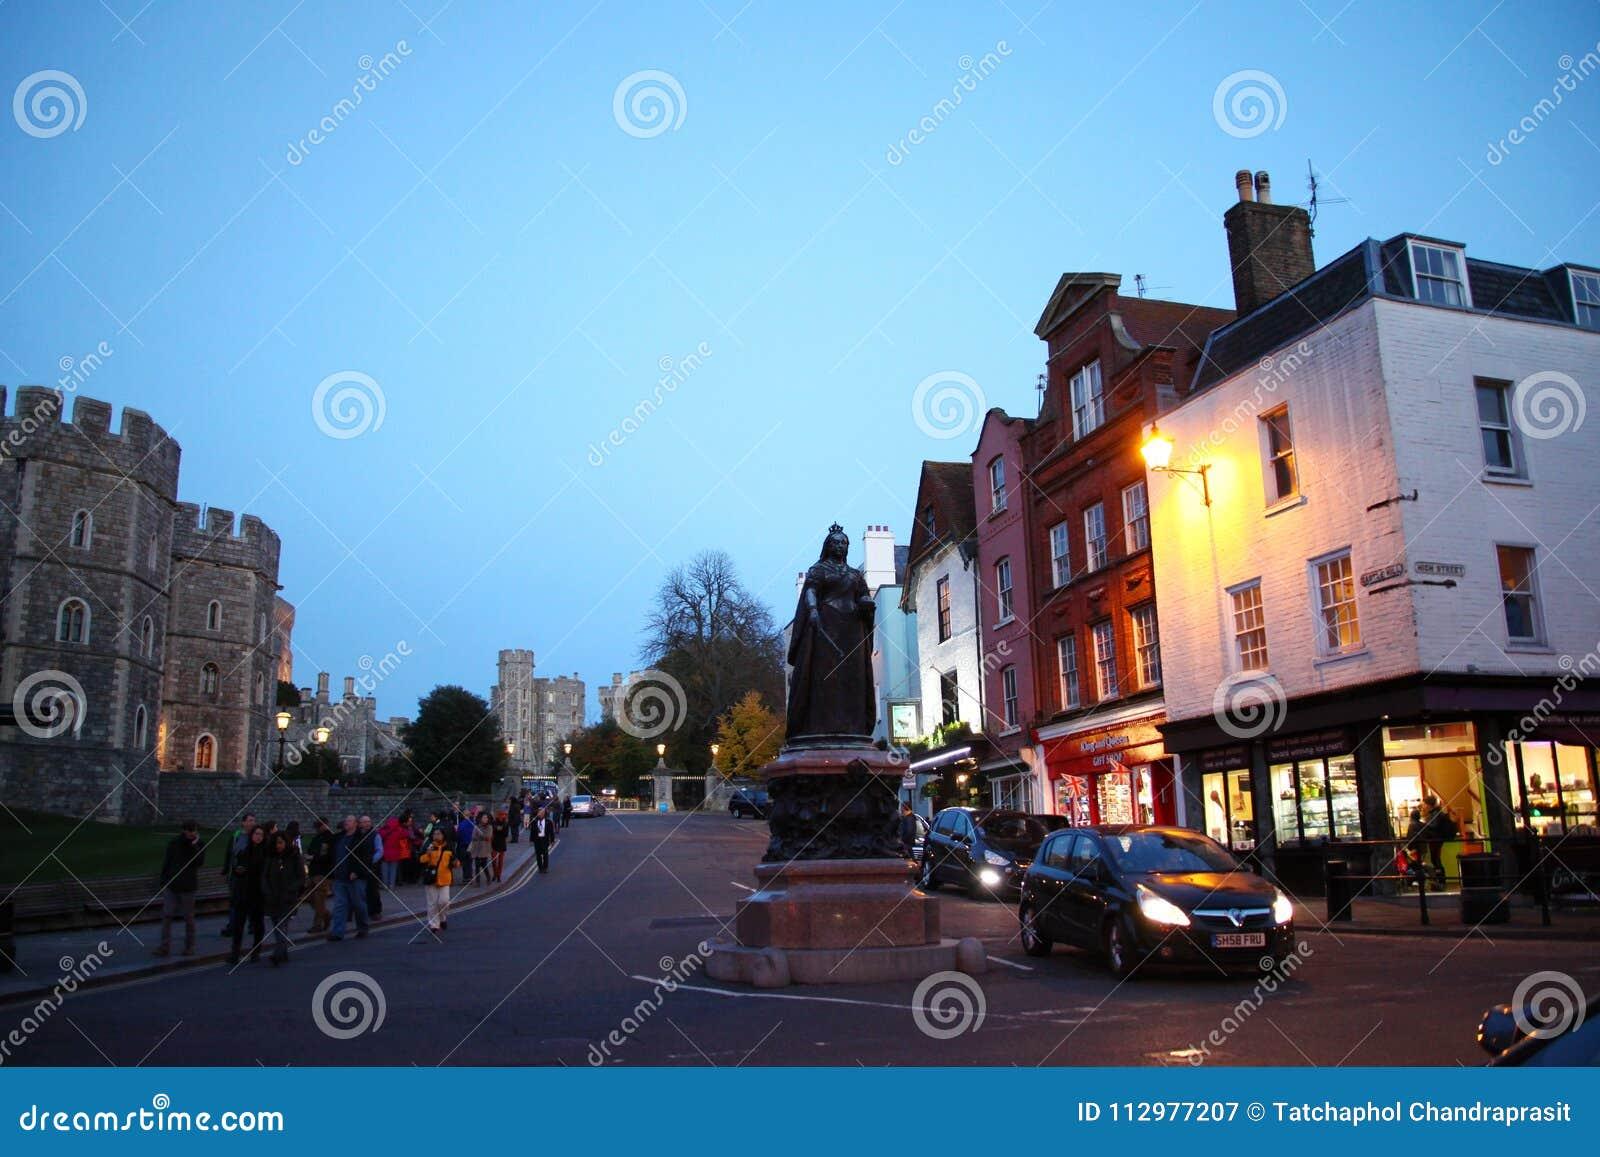 Windsor castle scene.